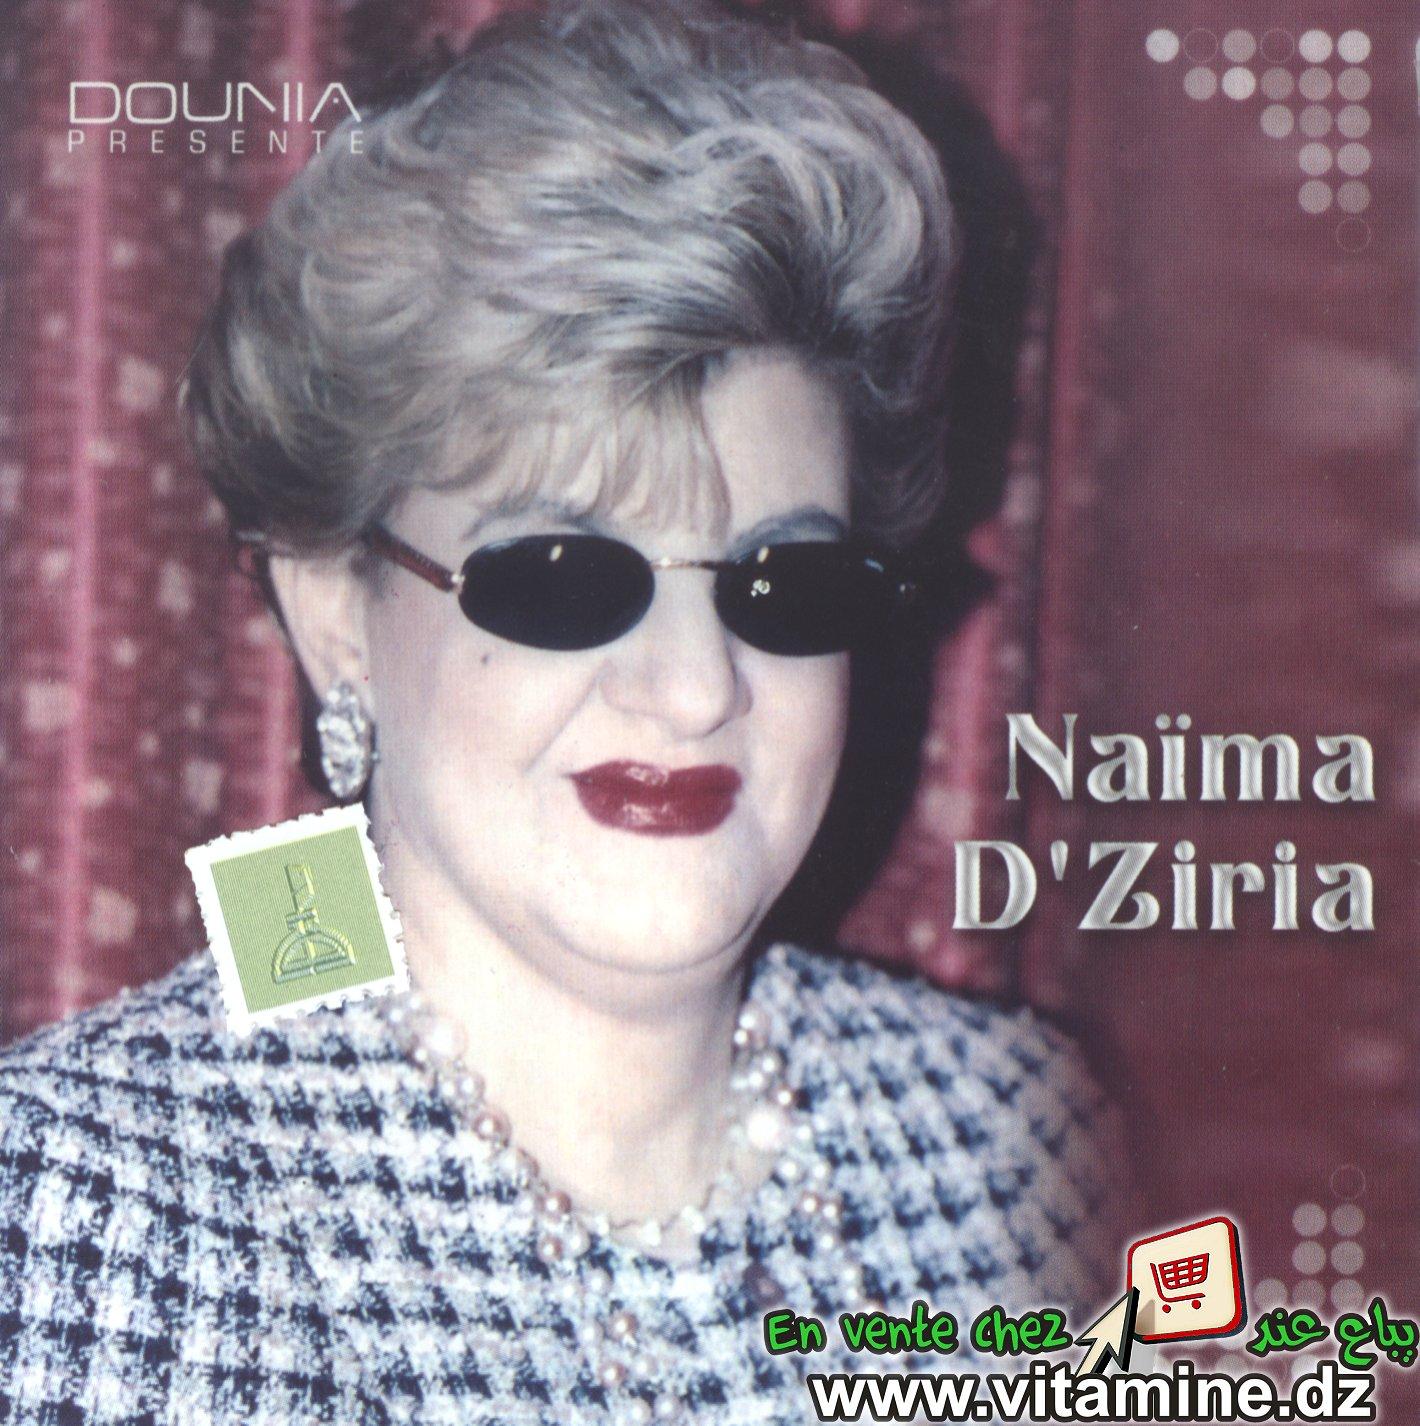 Naima D'ziria - compilation (2)